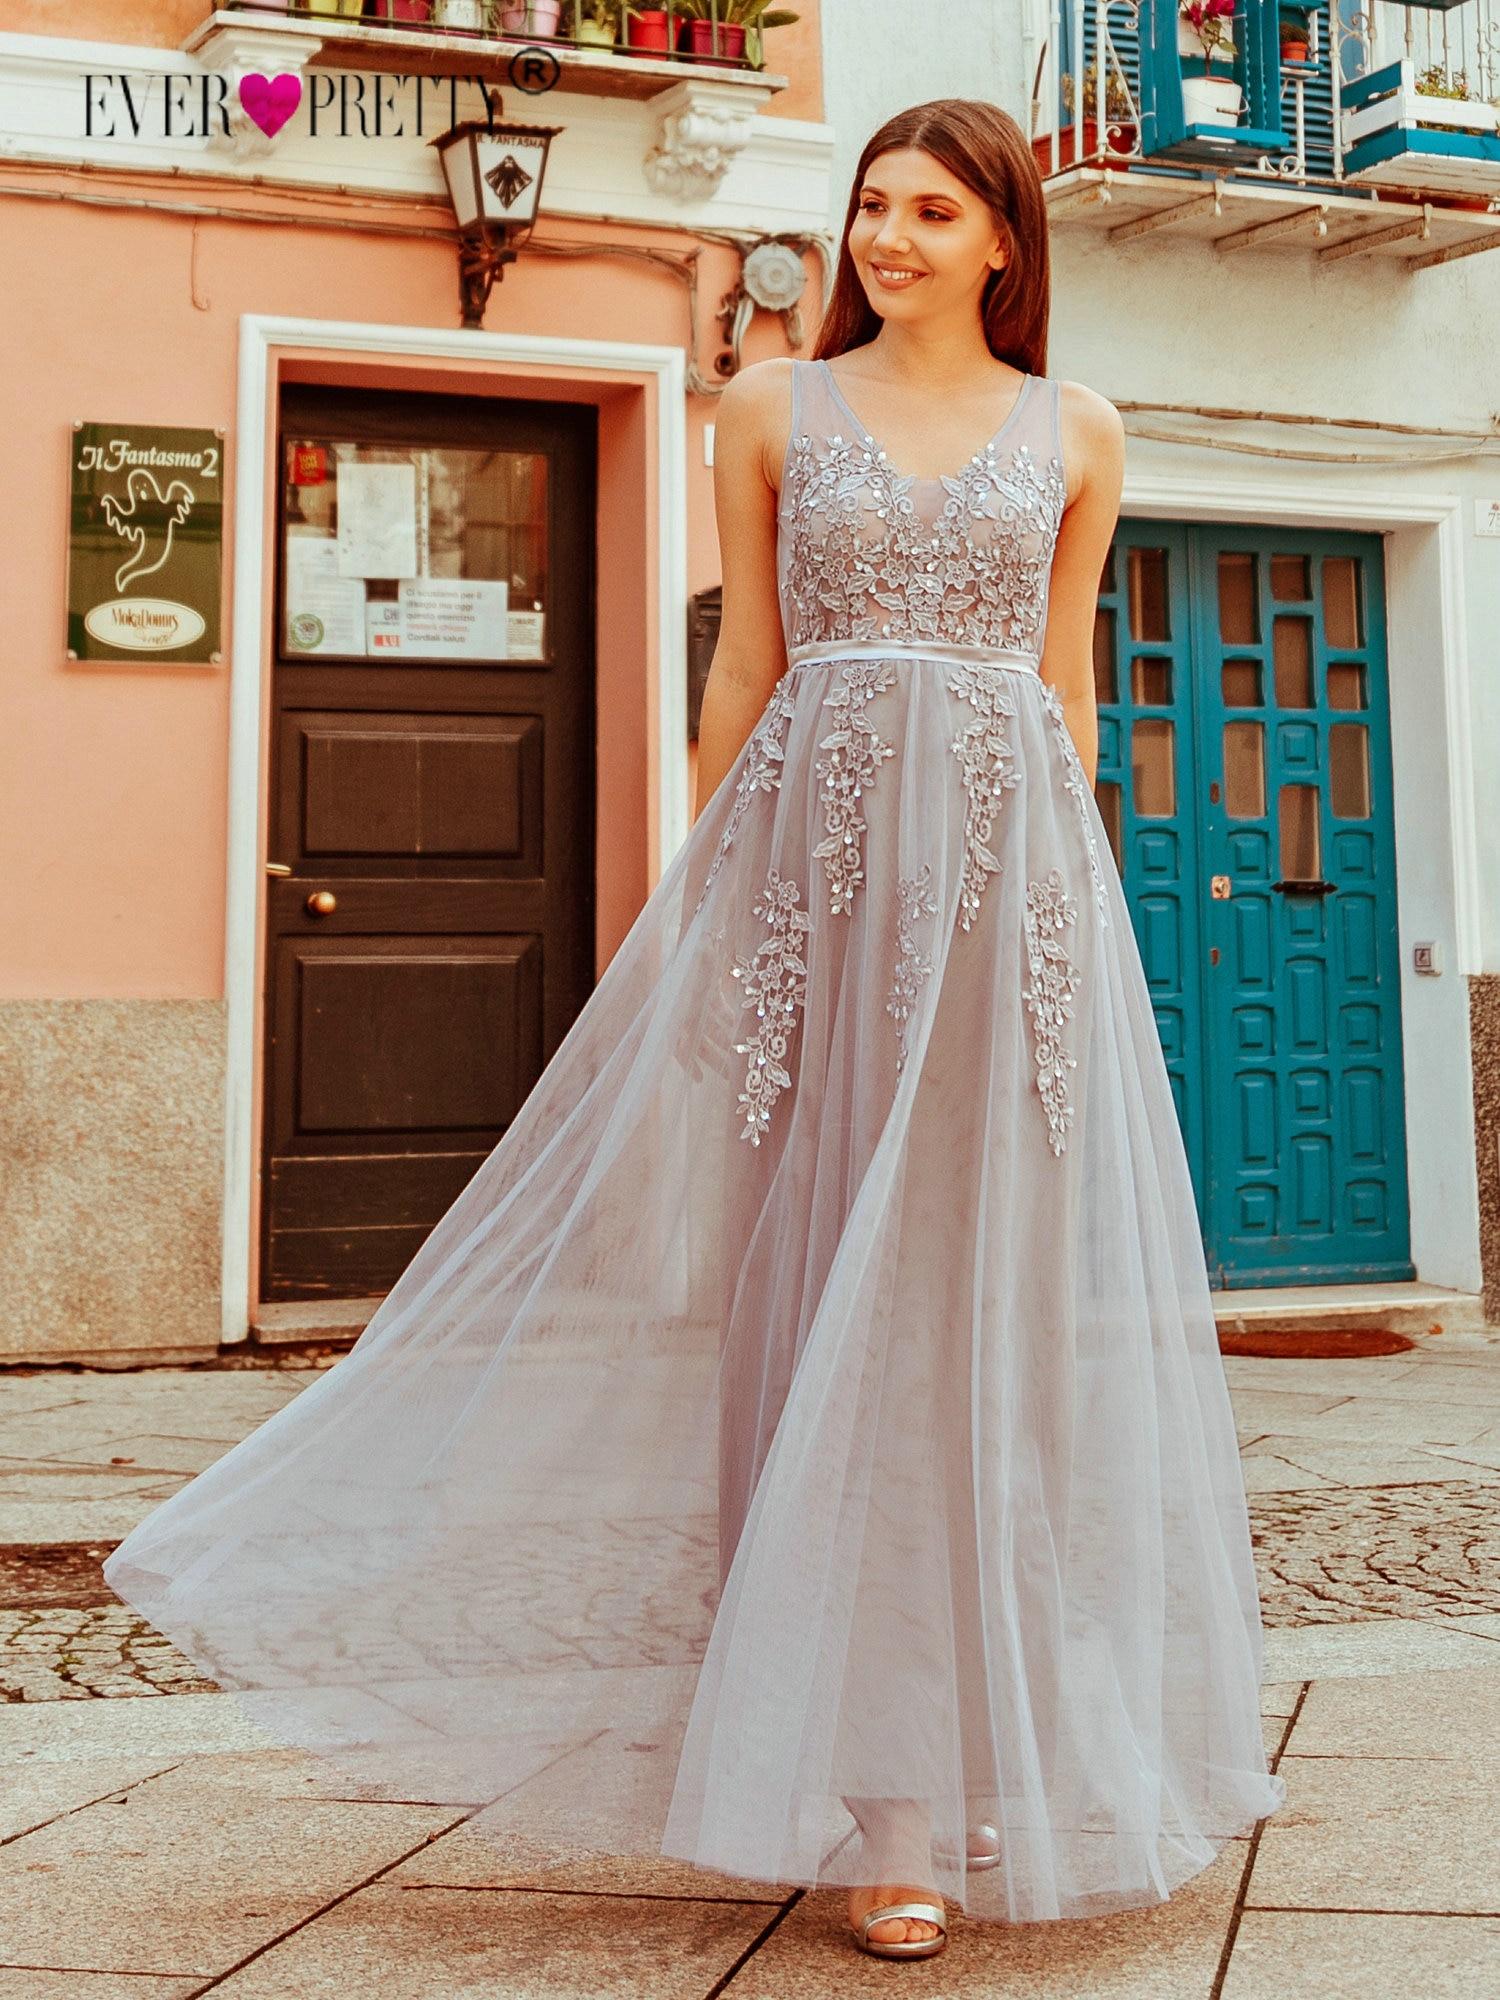 Prom Dresses Long 2019 Ever Pretty Elegant Long V-neck Tulle Lace Applique Sleeveless A-line Hot Selling Vestidos De Graduacion